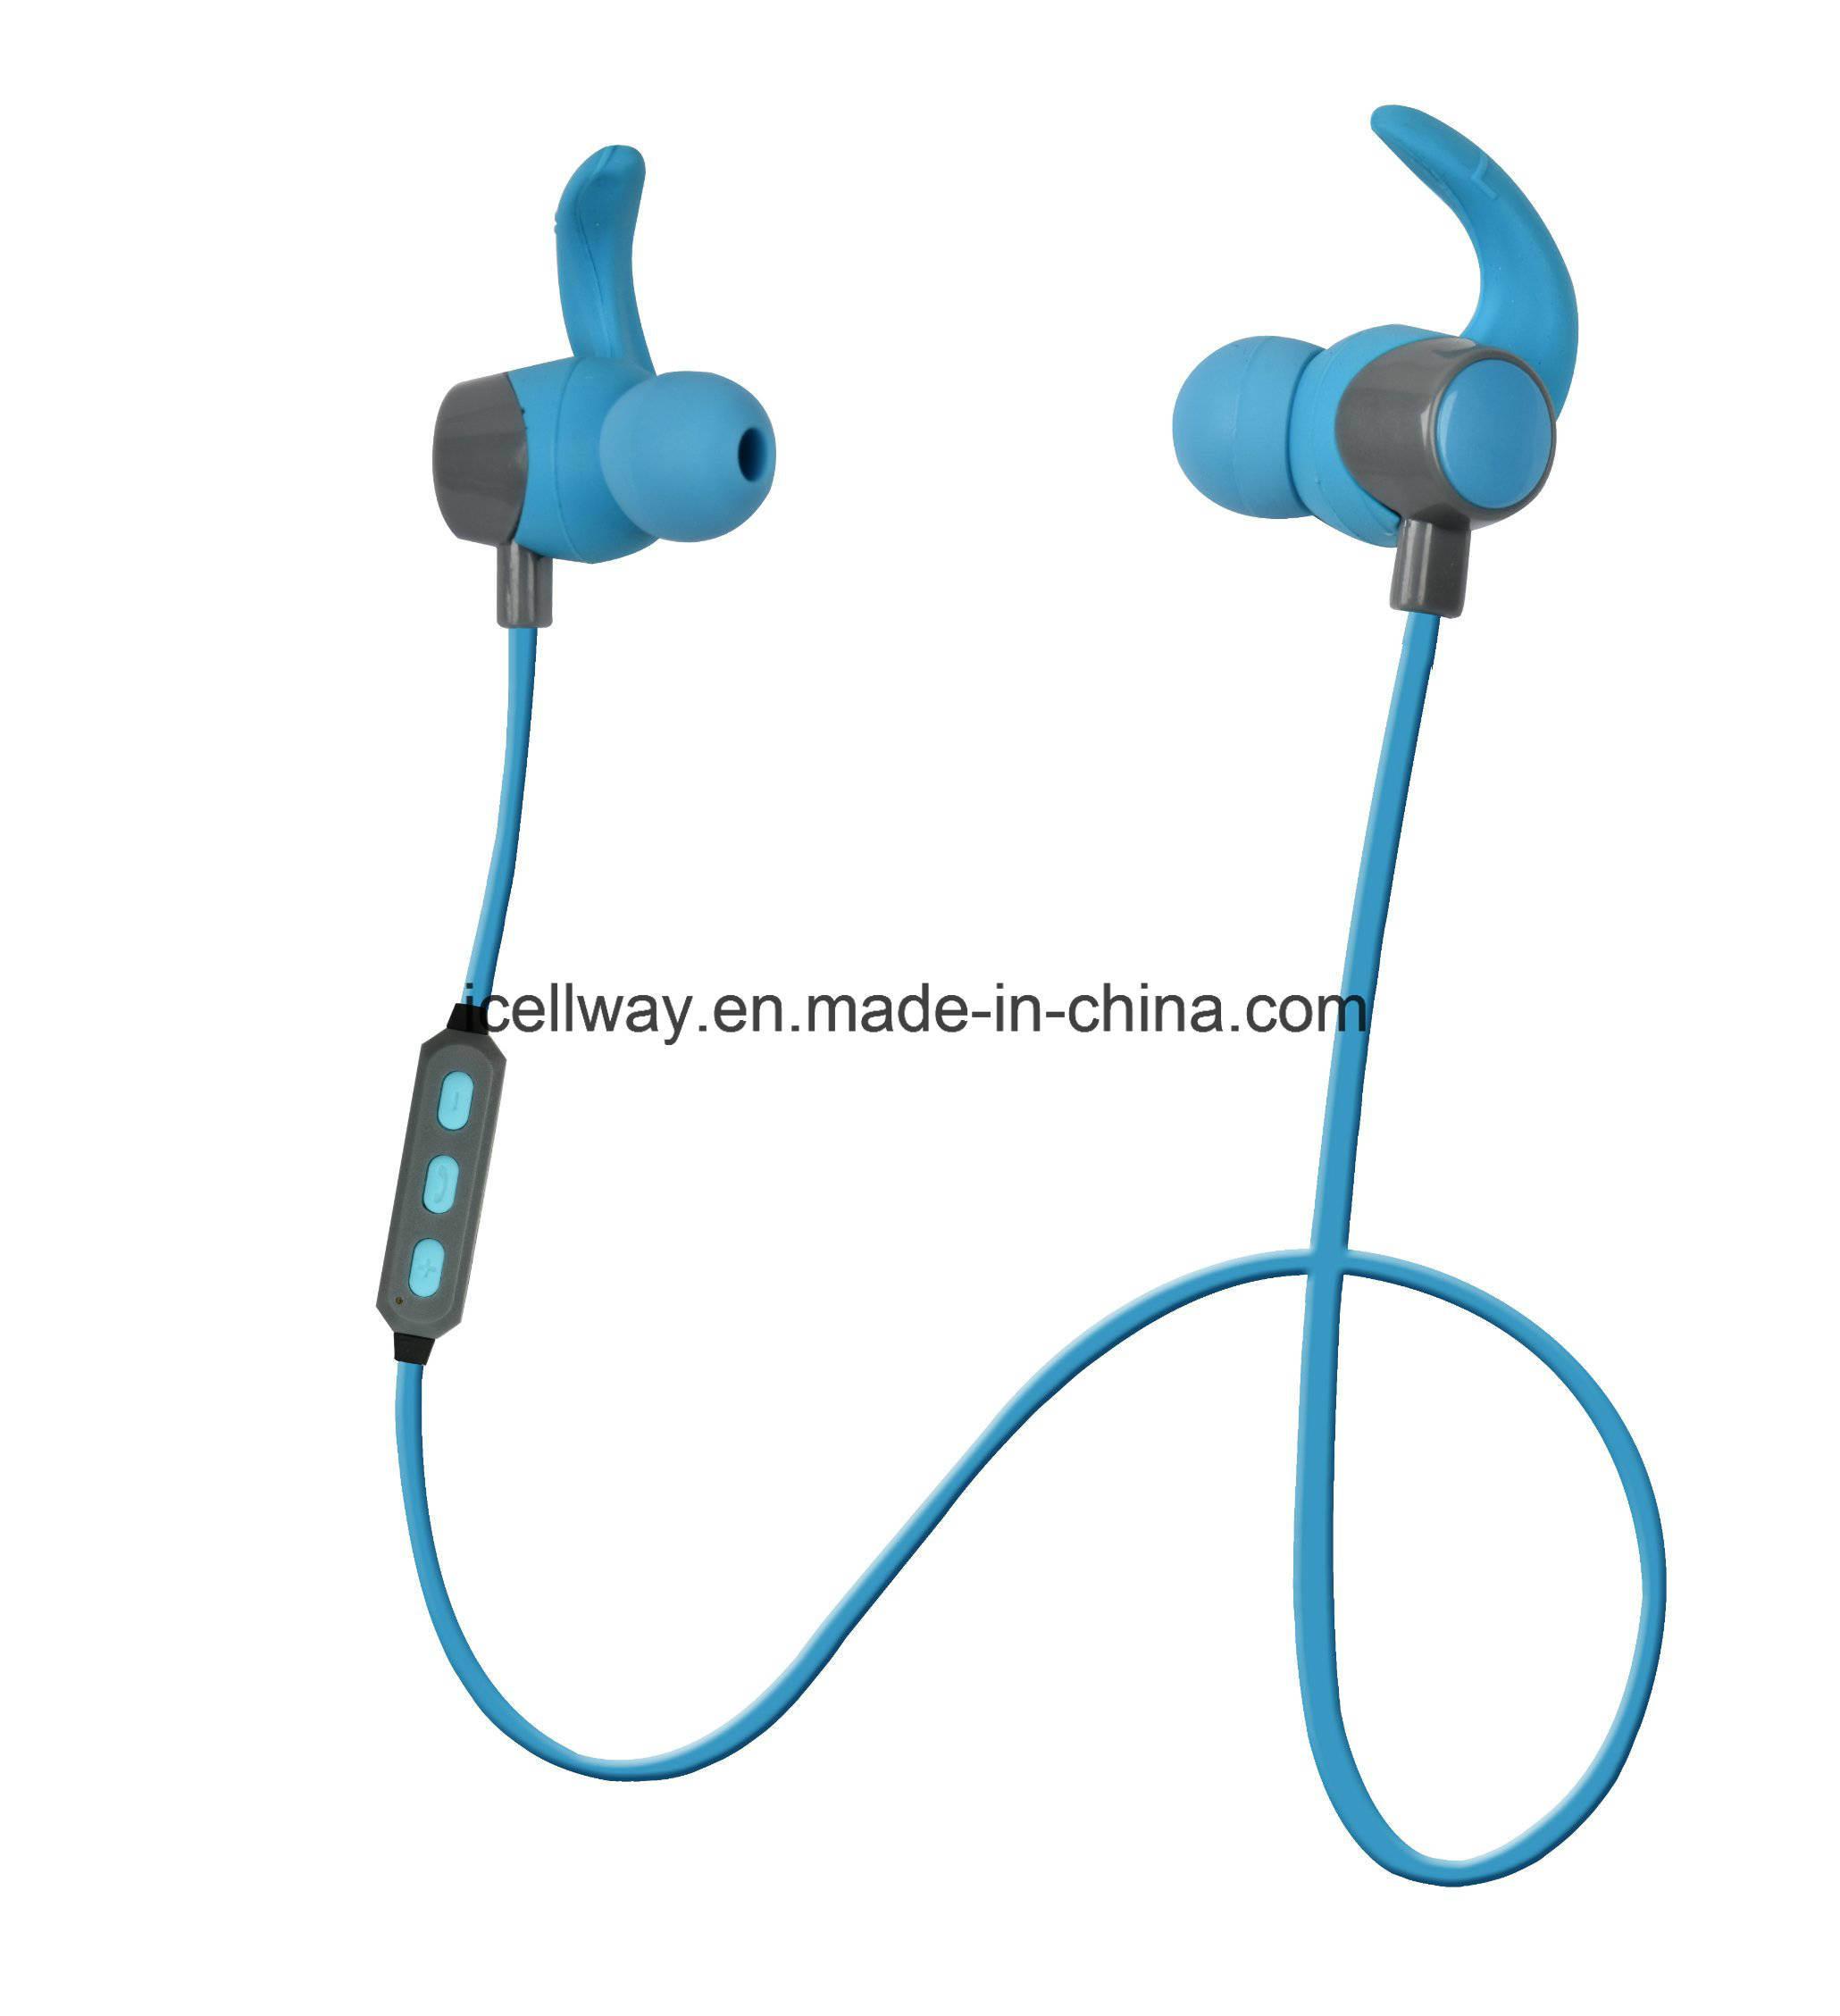 [Hot Item] Factory Wholesale Professional Beats Earphone Stereo Headset  Beats Headphone Bluetooth Wireless Best Price